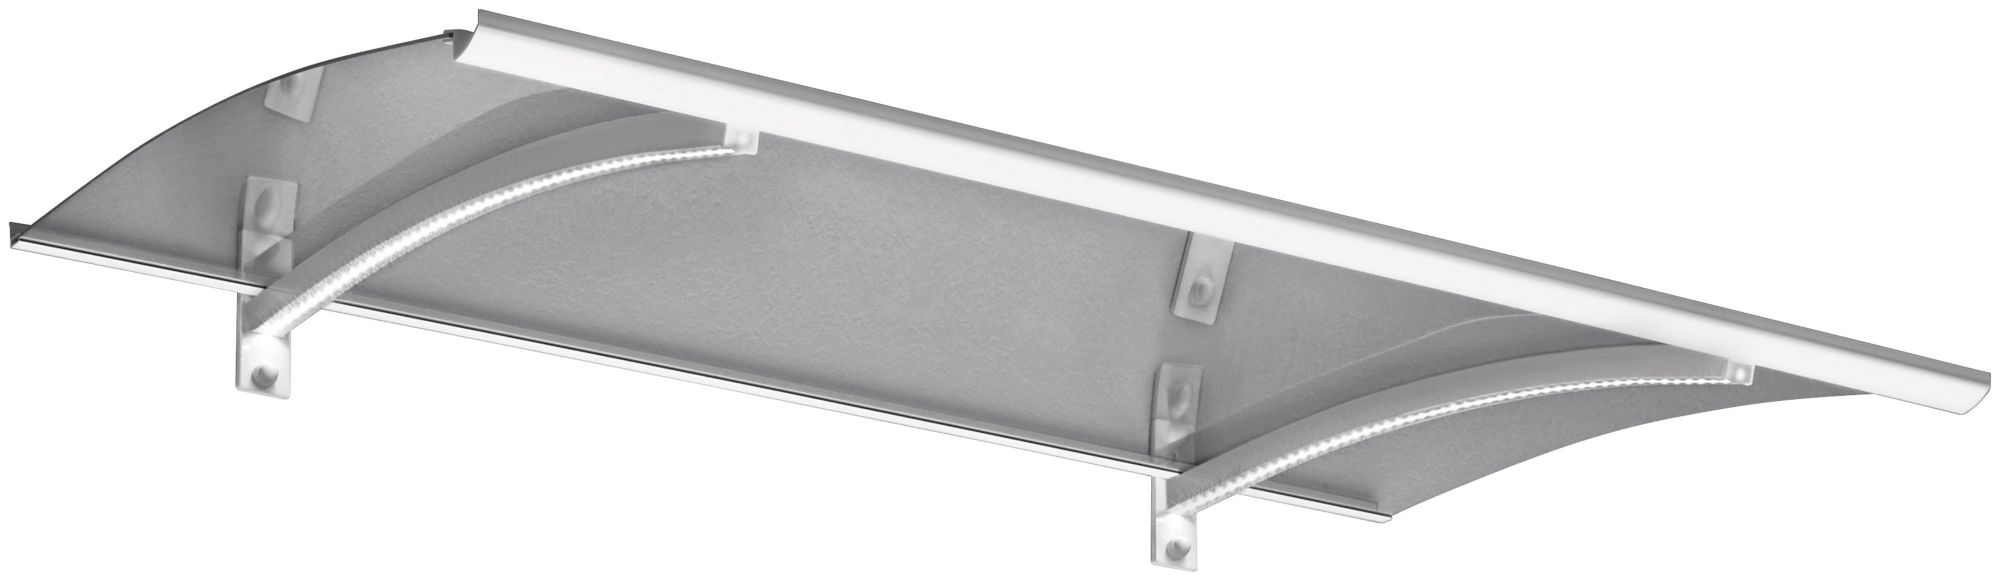 GUTTA Bogenvordach »LED-Technik«, 150x90x25 cm, weiß-transparent